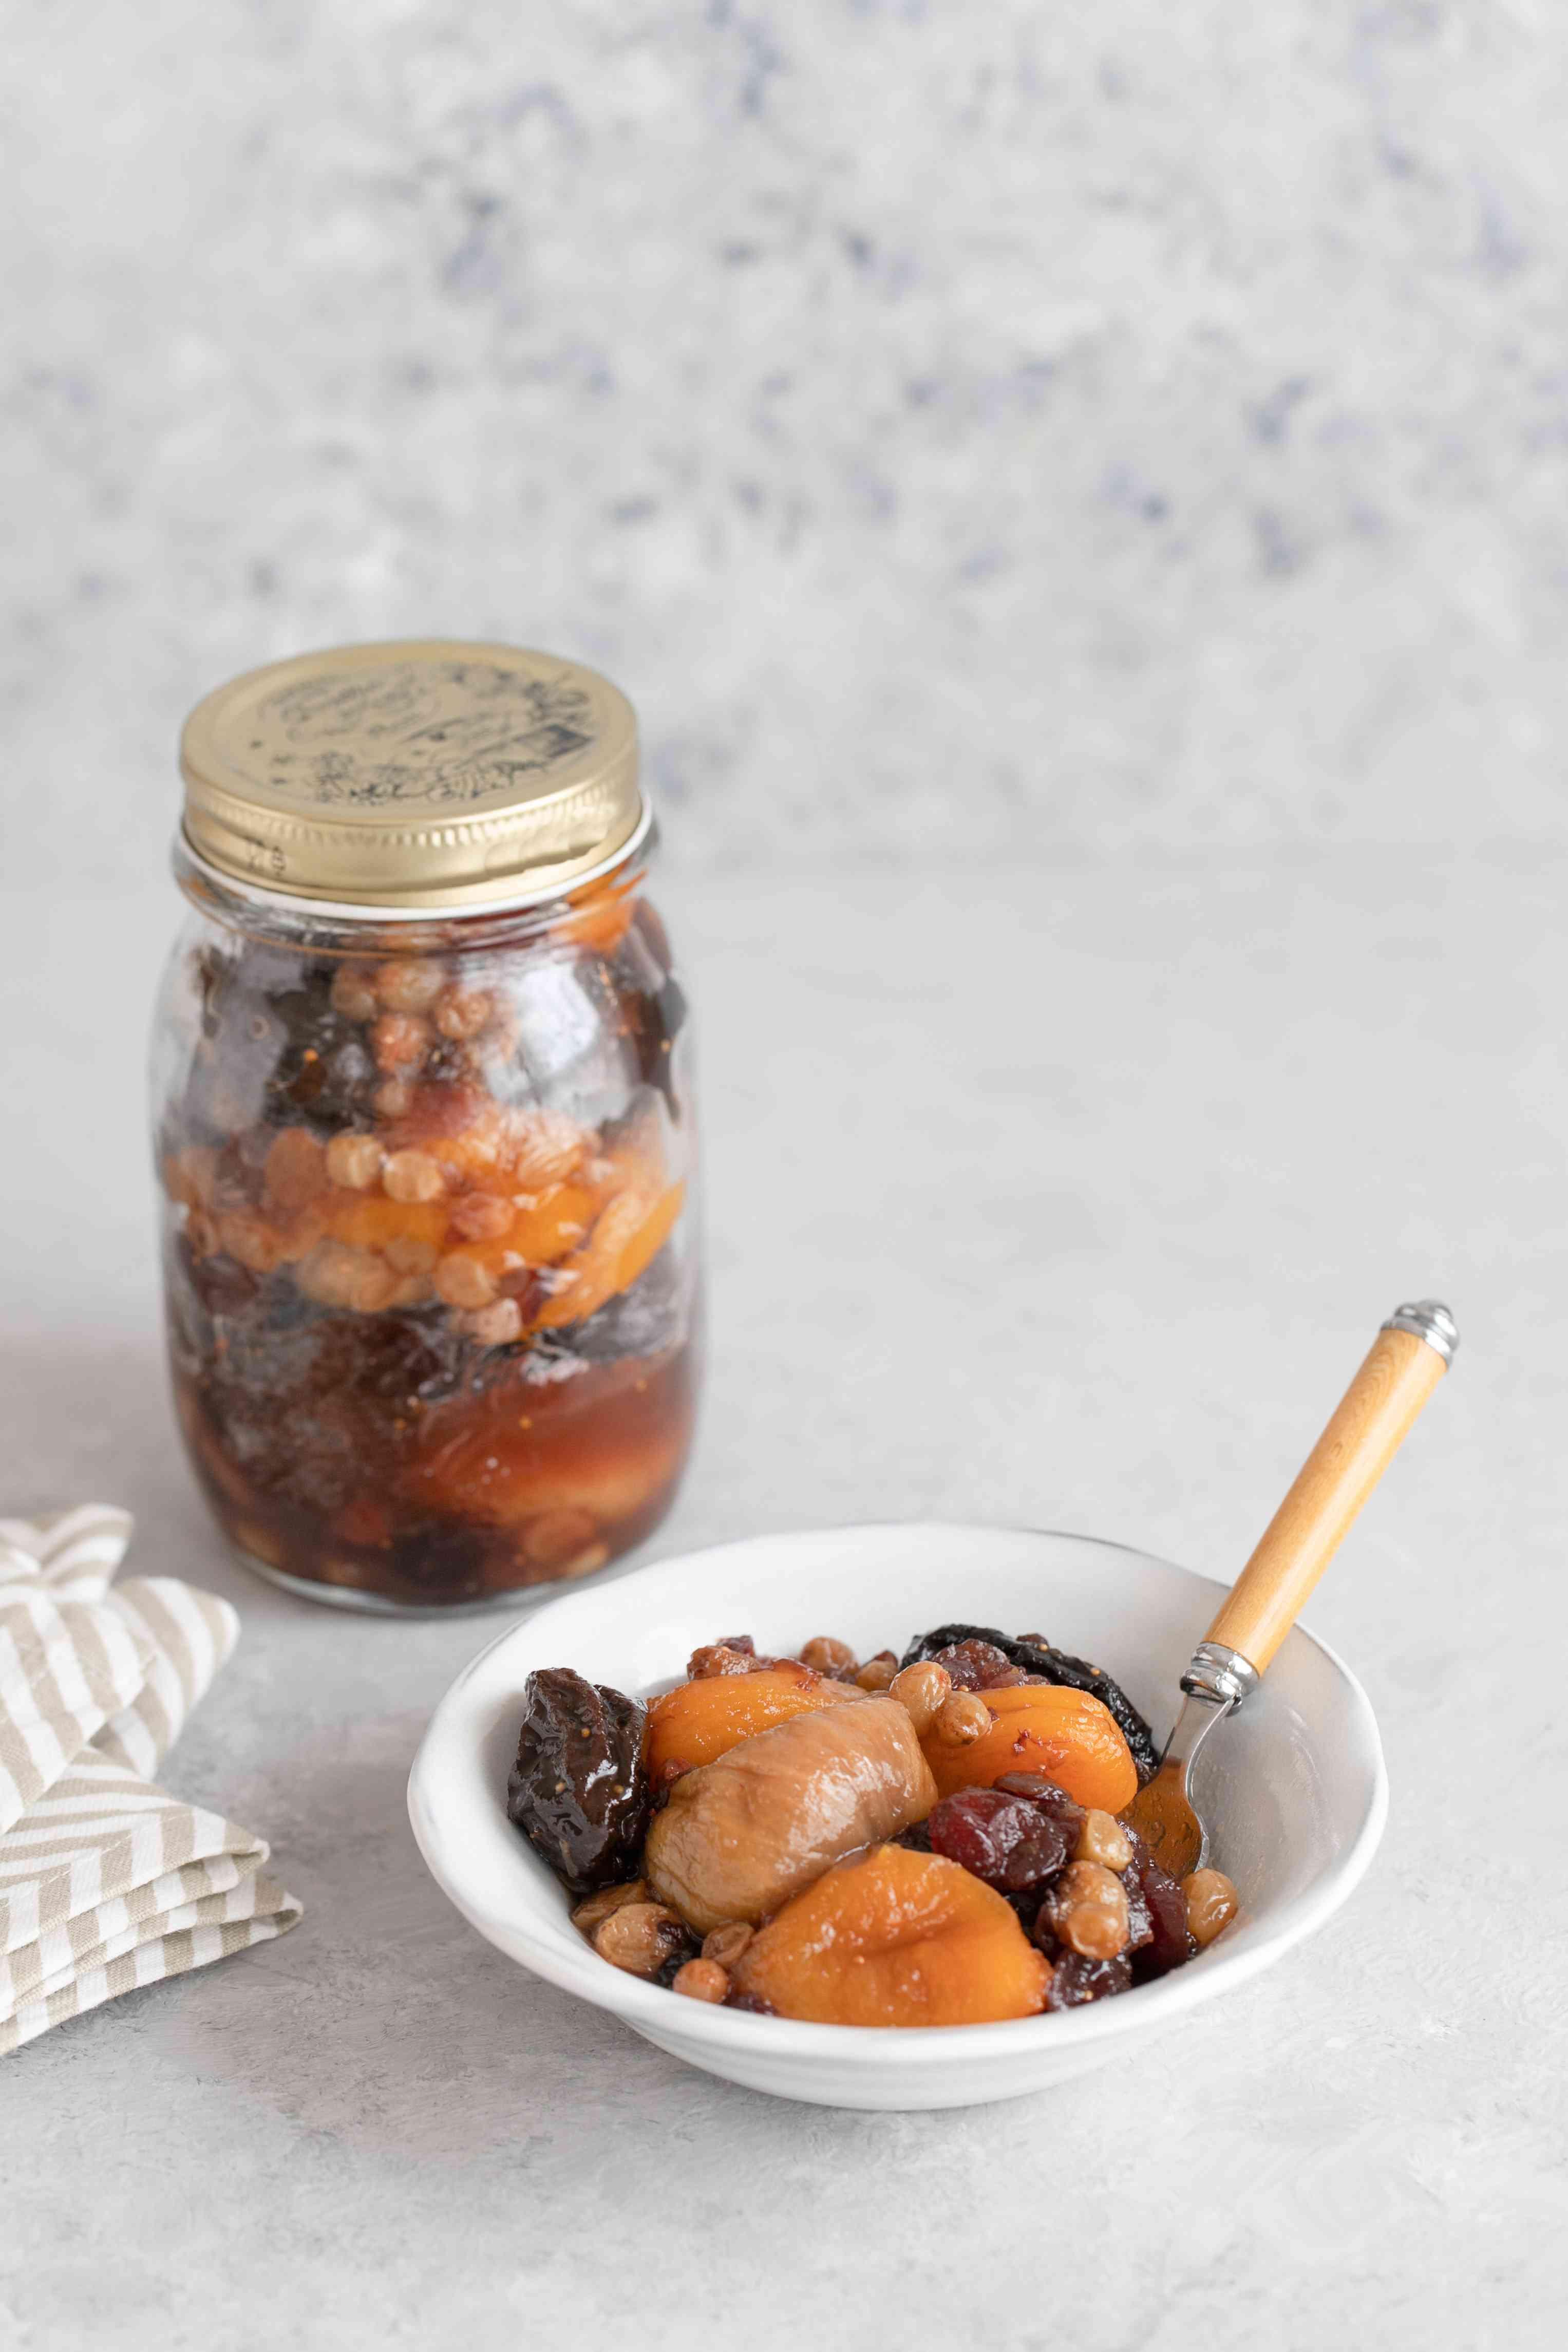 Polish Dried Fruit Compote (Kompot) Recipe